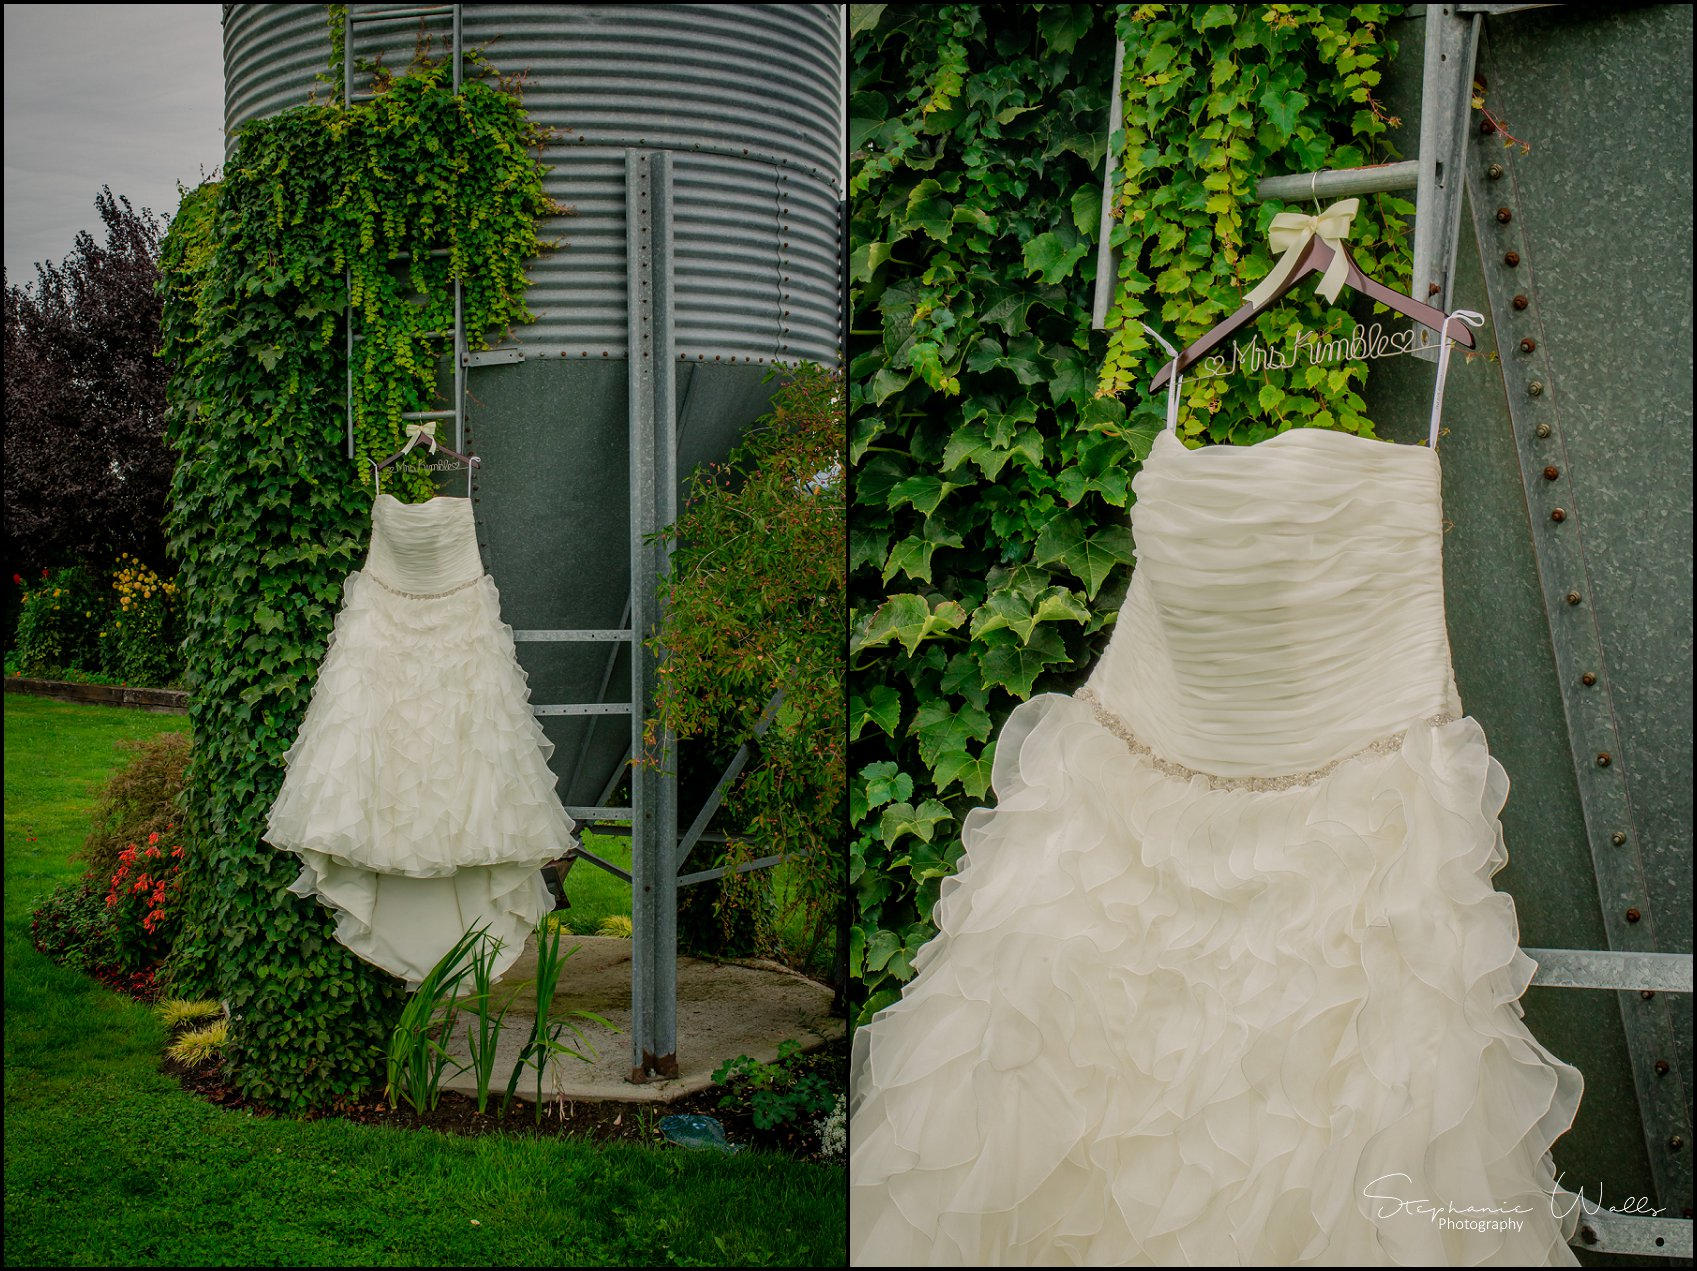 Kimble Wedding 013 Marlena & Allans | Snohomish Red Barn Events (Stocker Farms) | Snohomish, Wa Wedding Photographer